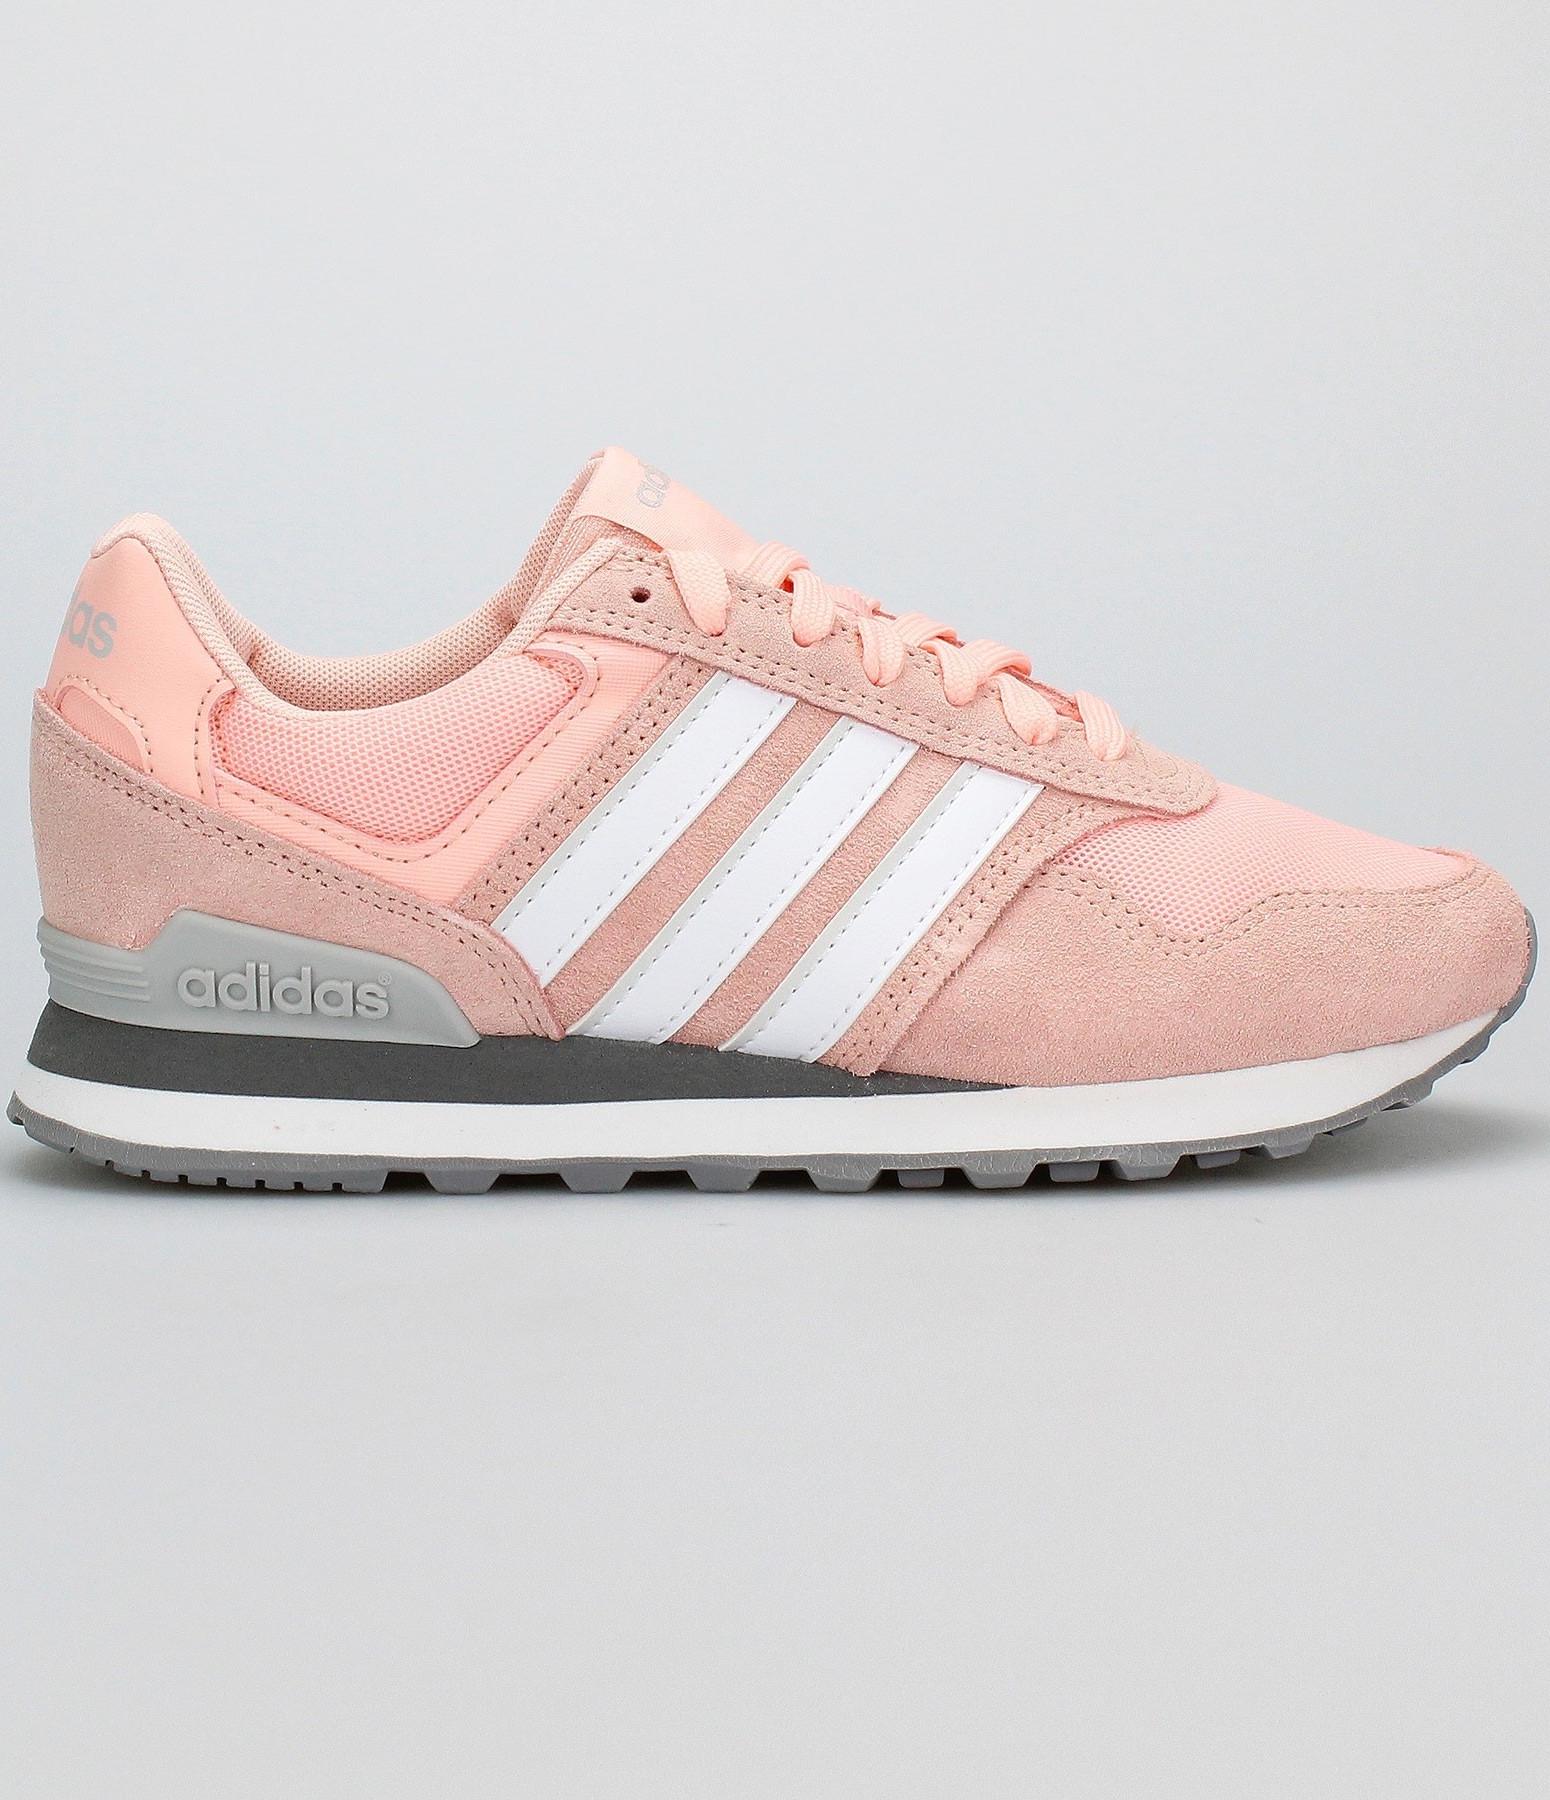 scarpe adidas donna 2018 rosa